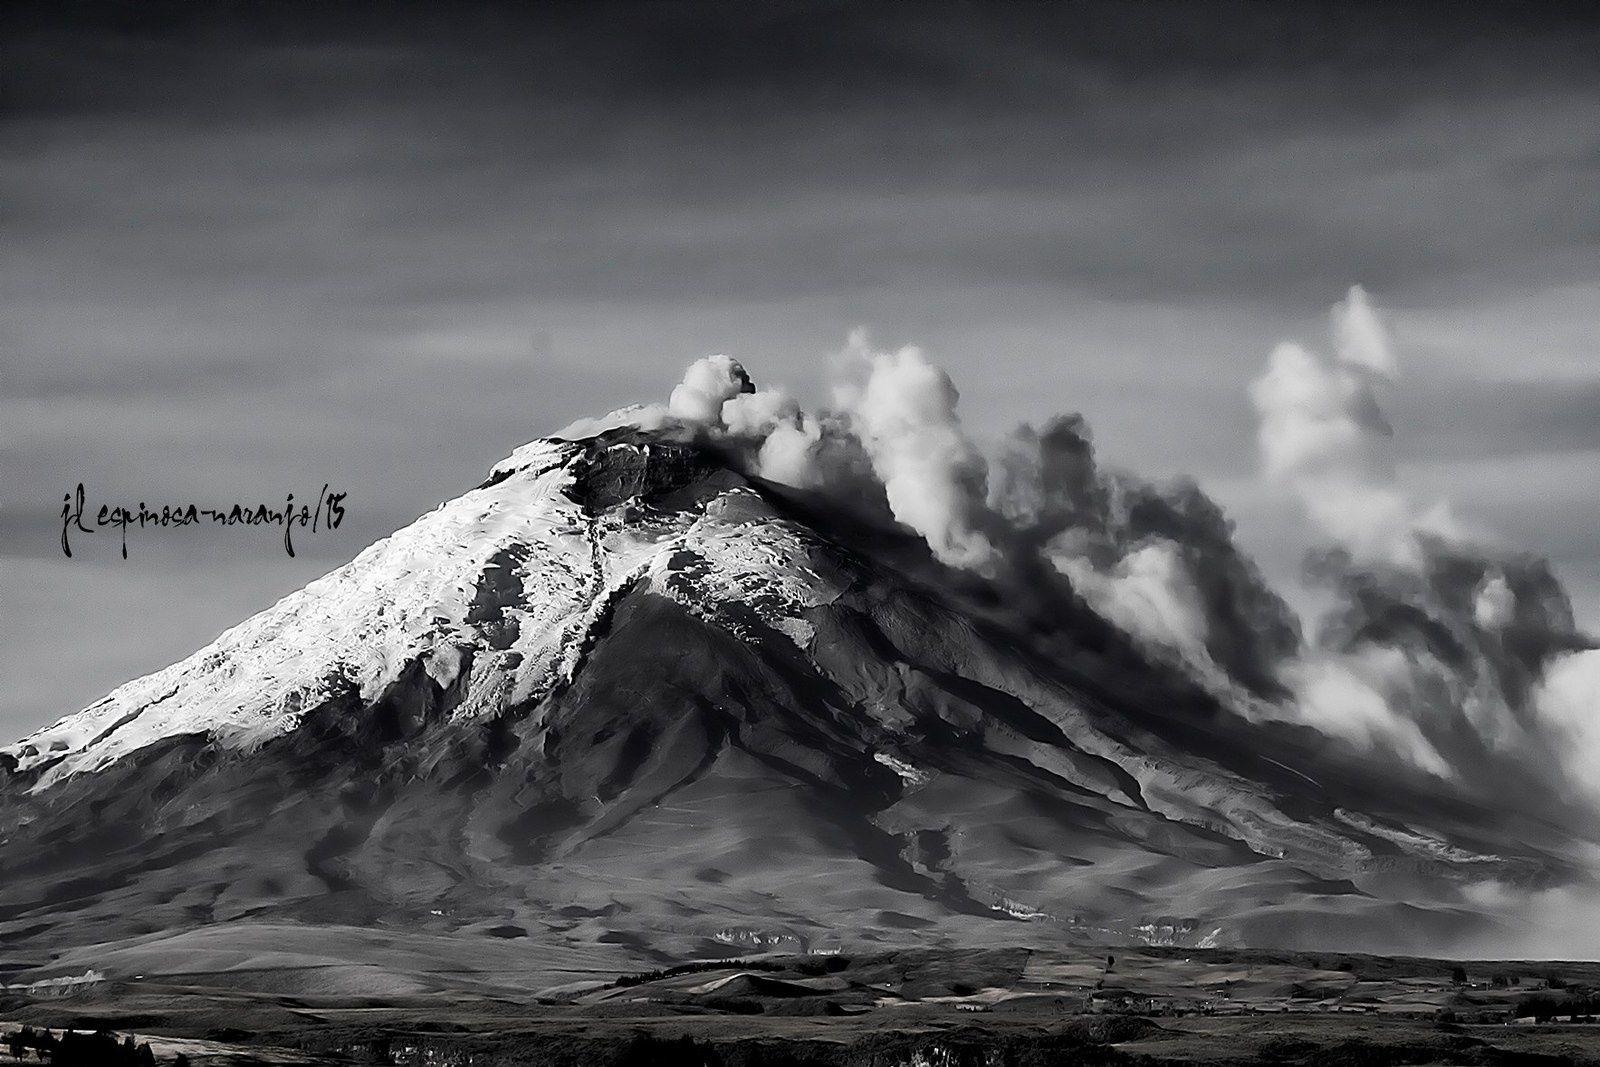 Equateur - Cotopaxi - photo José Luis Espinosa-Naranjo 12.2015